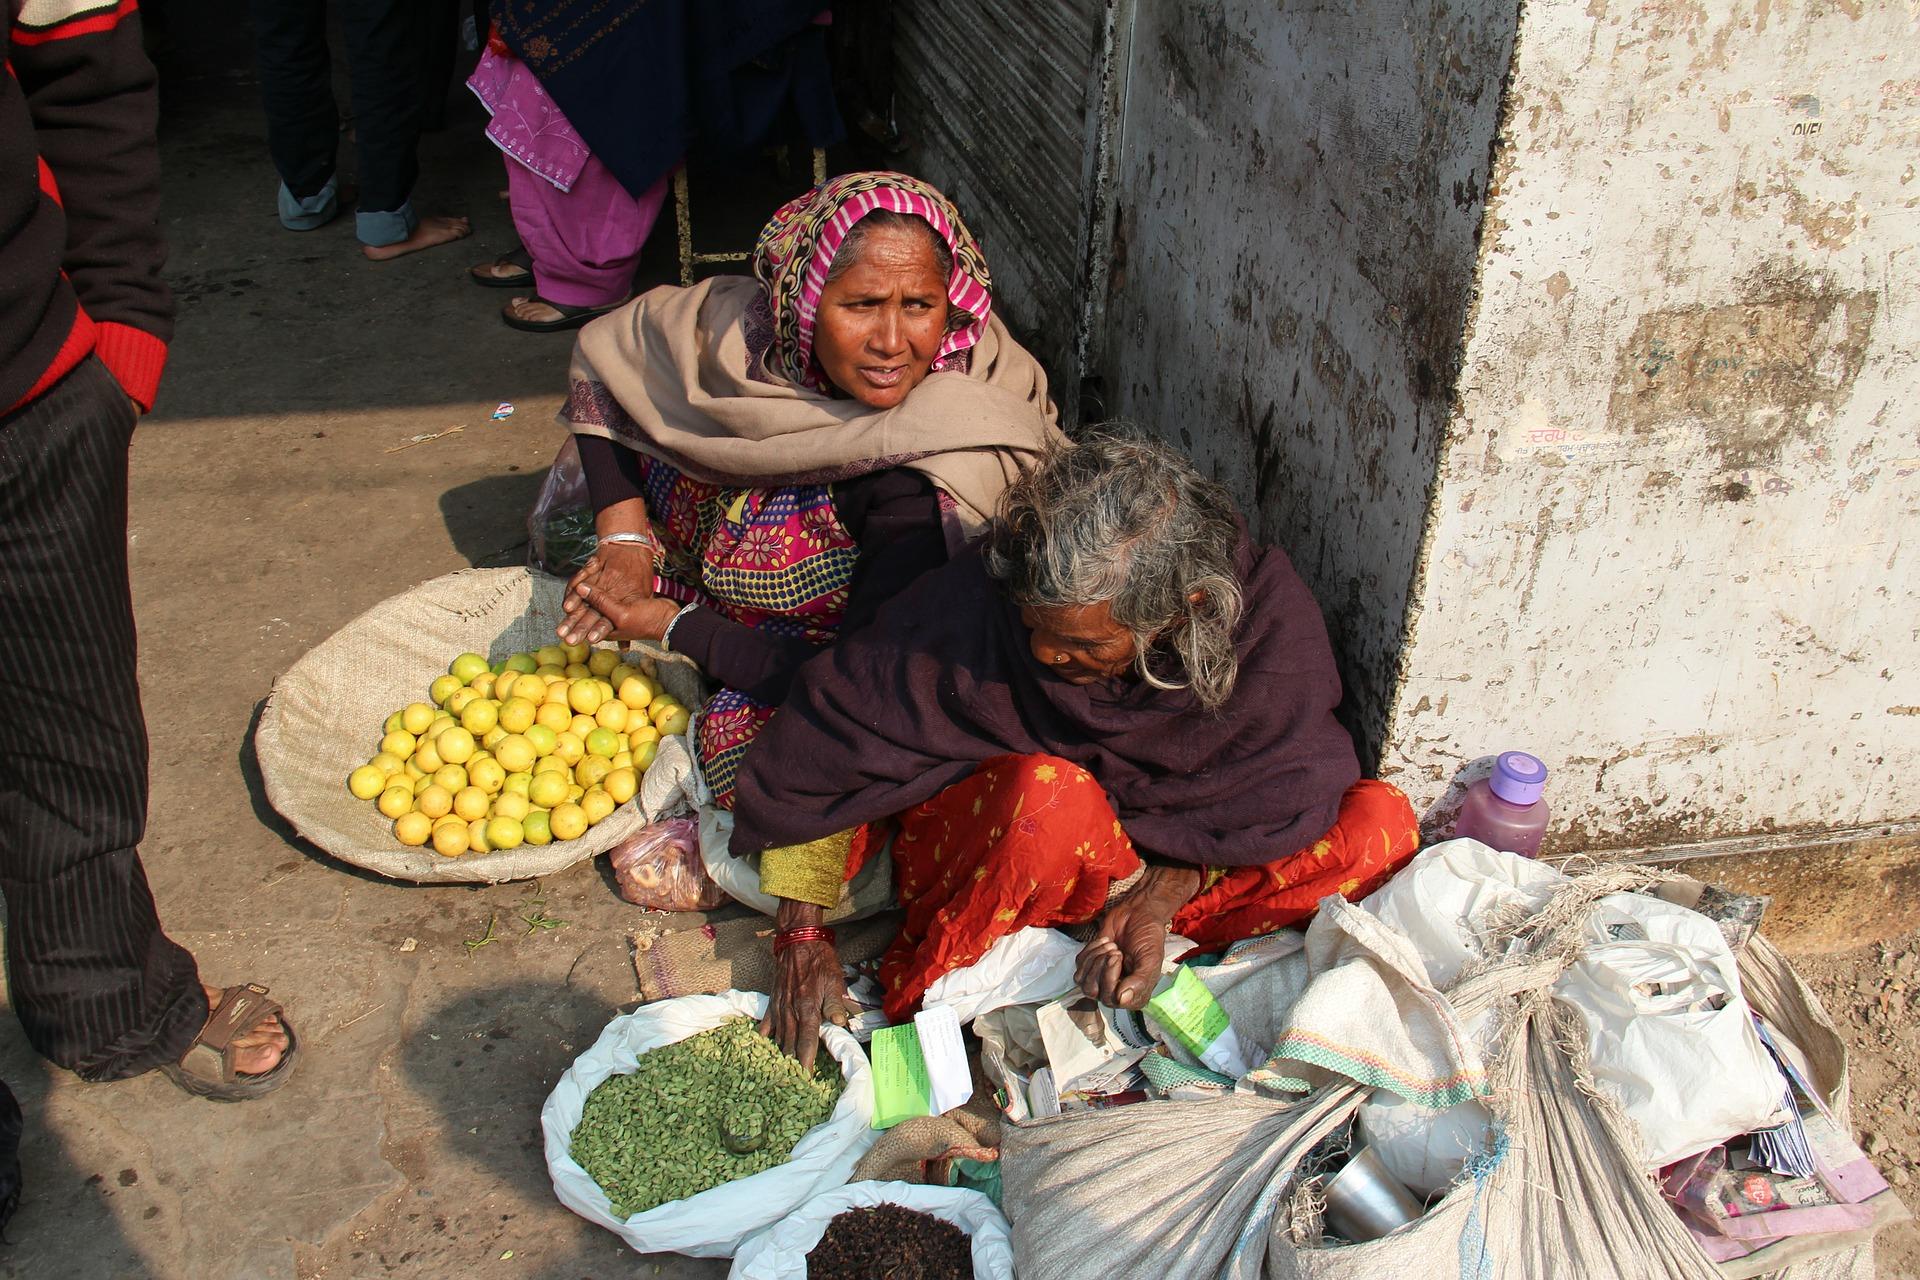 Women shop assistant in a market